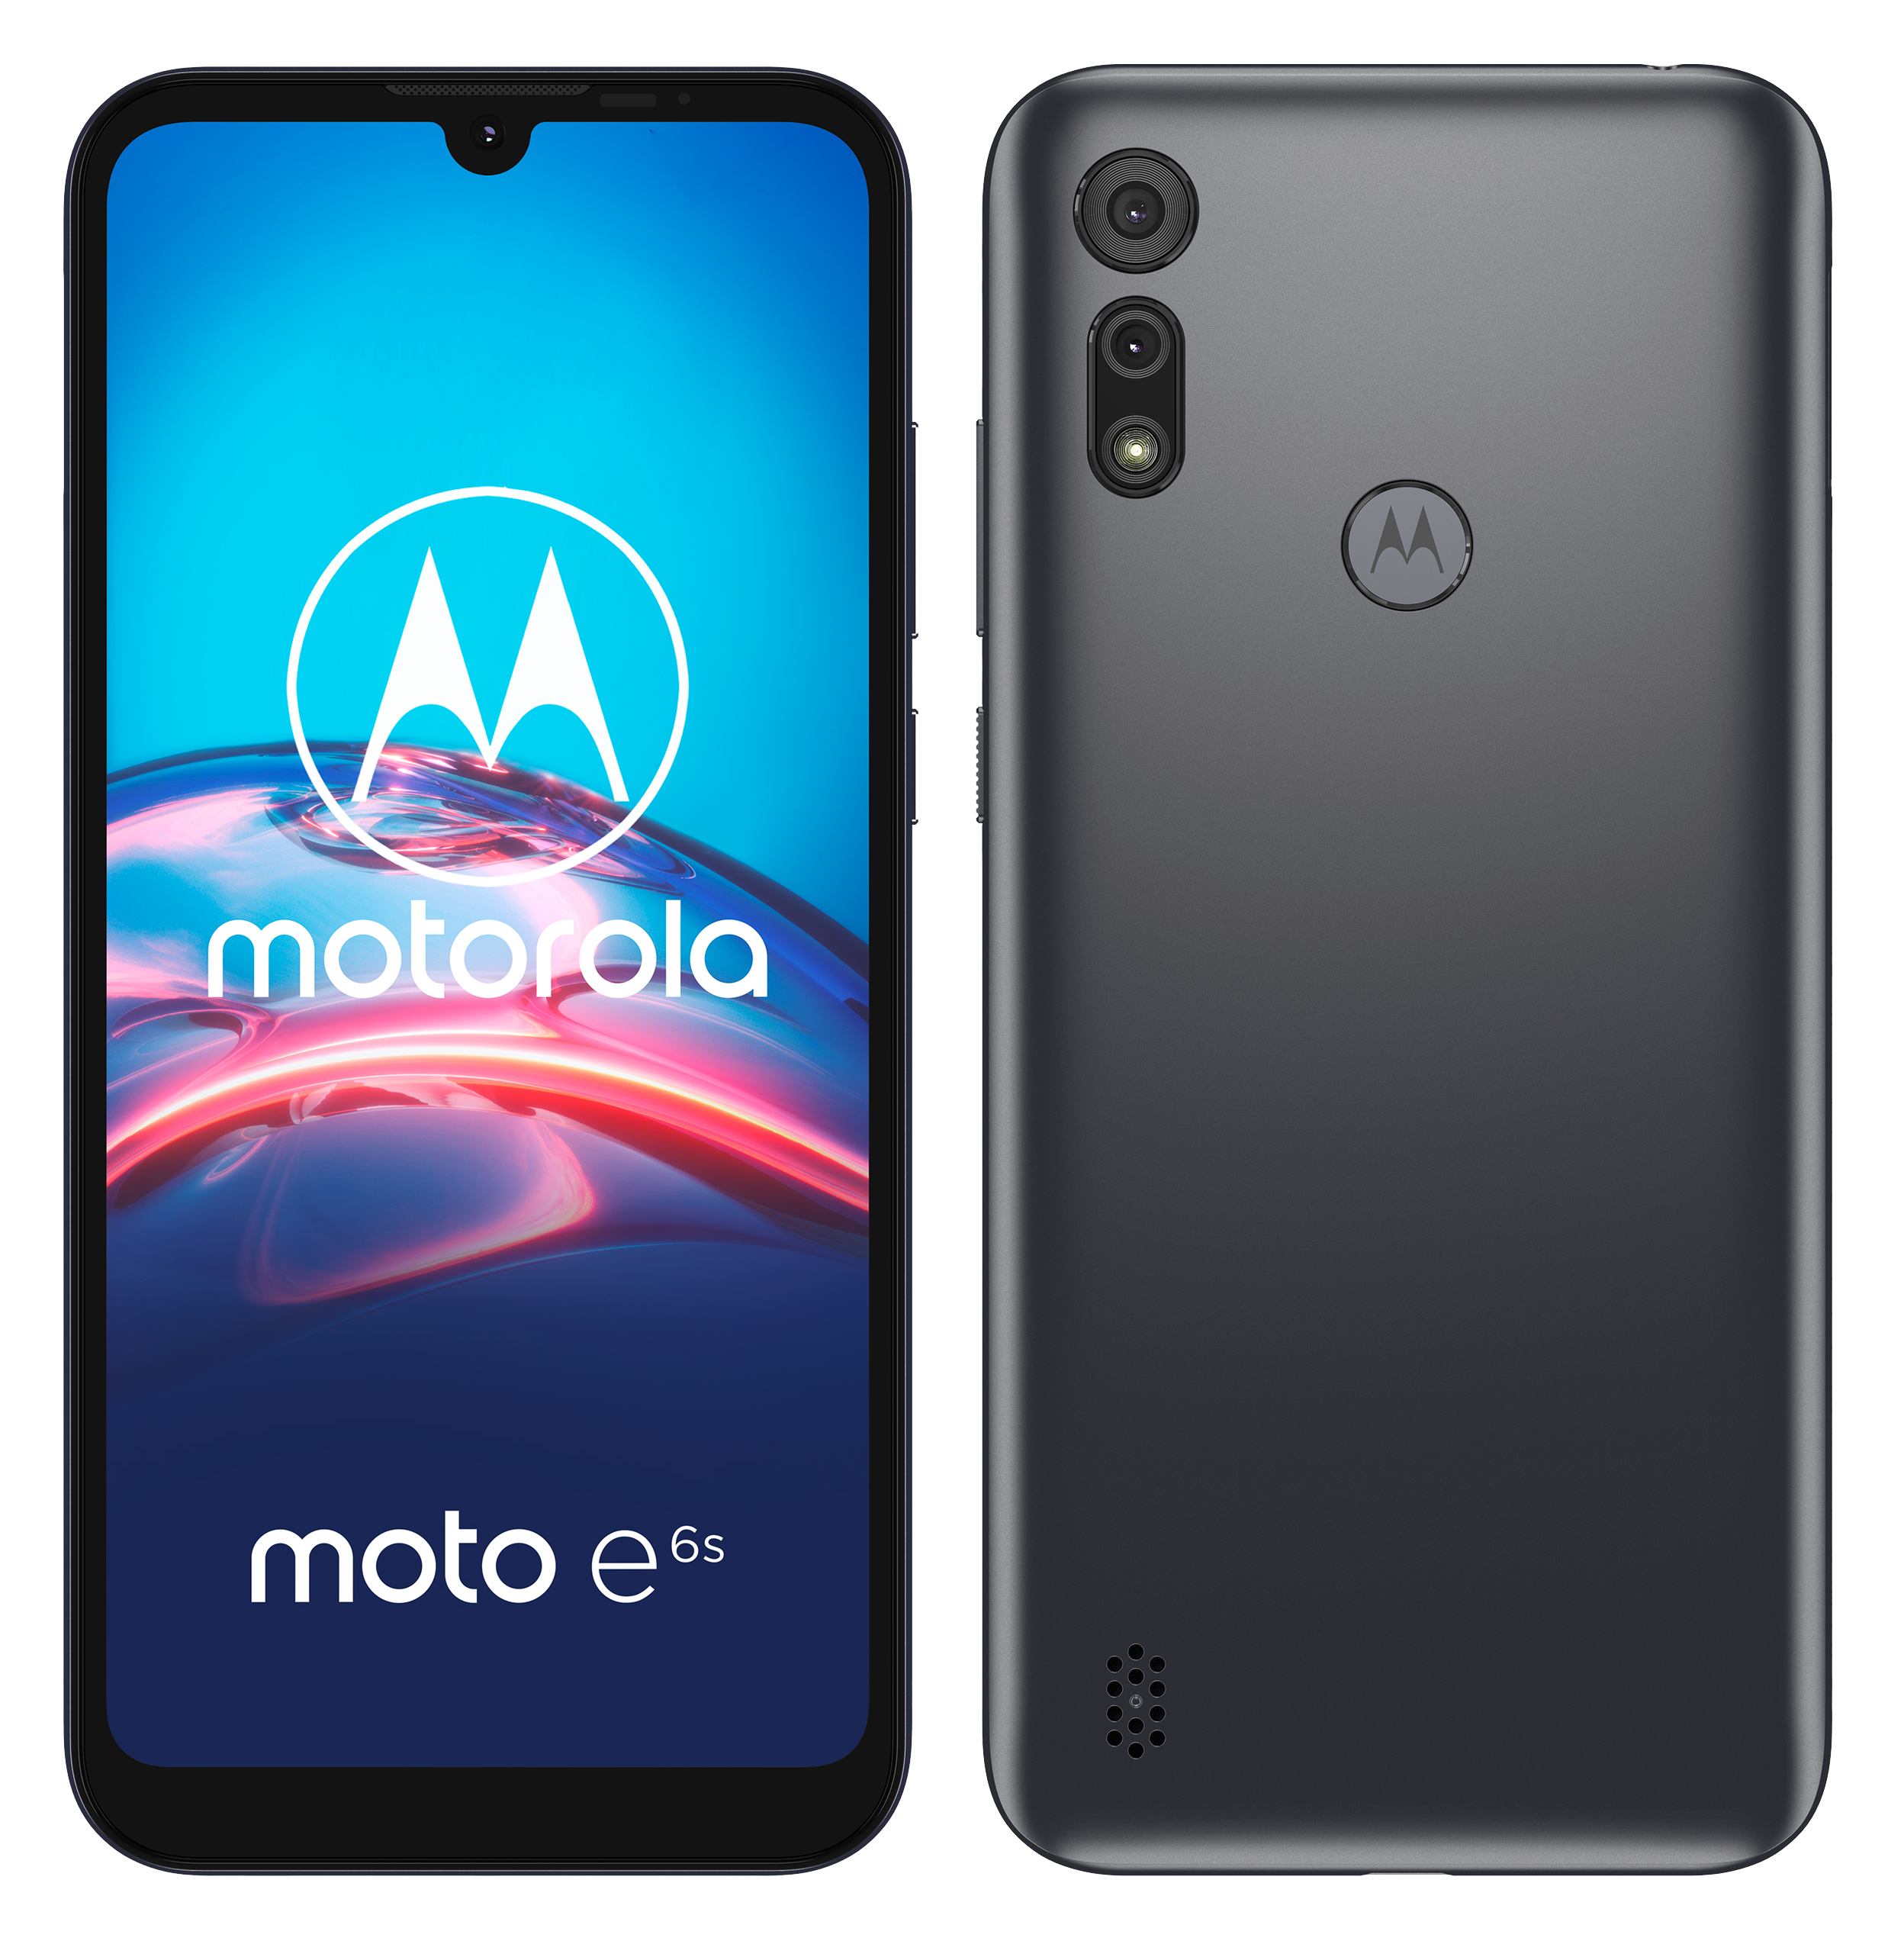 MOTOROLA Moto e6s, 15,5 cm (6,1''), HD+ Display, Android™ 9 Pie, 32 GB Speicher, 2 GB RAM, Octa-Core Prozessor, Dual-SIM, LTE